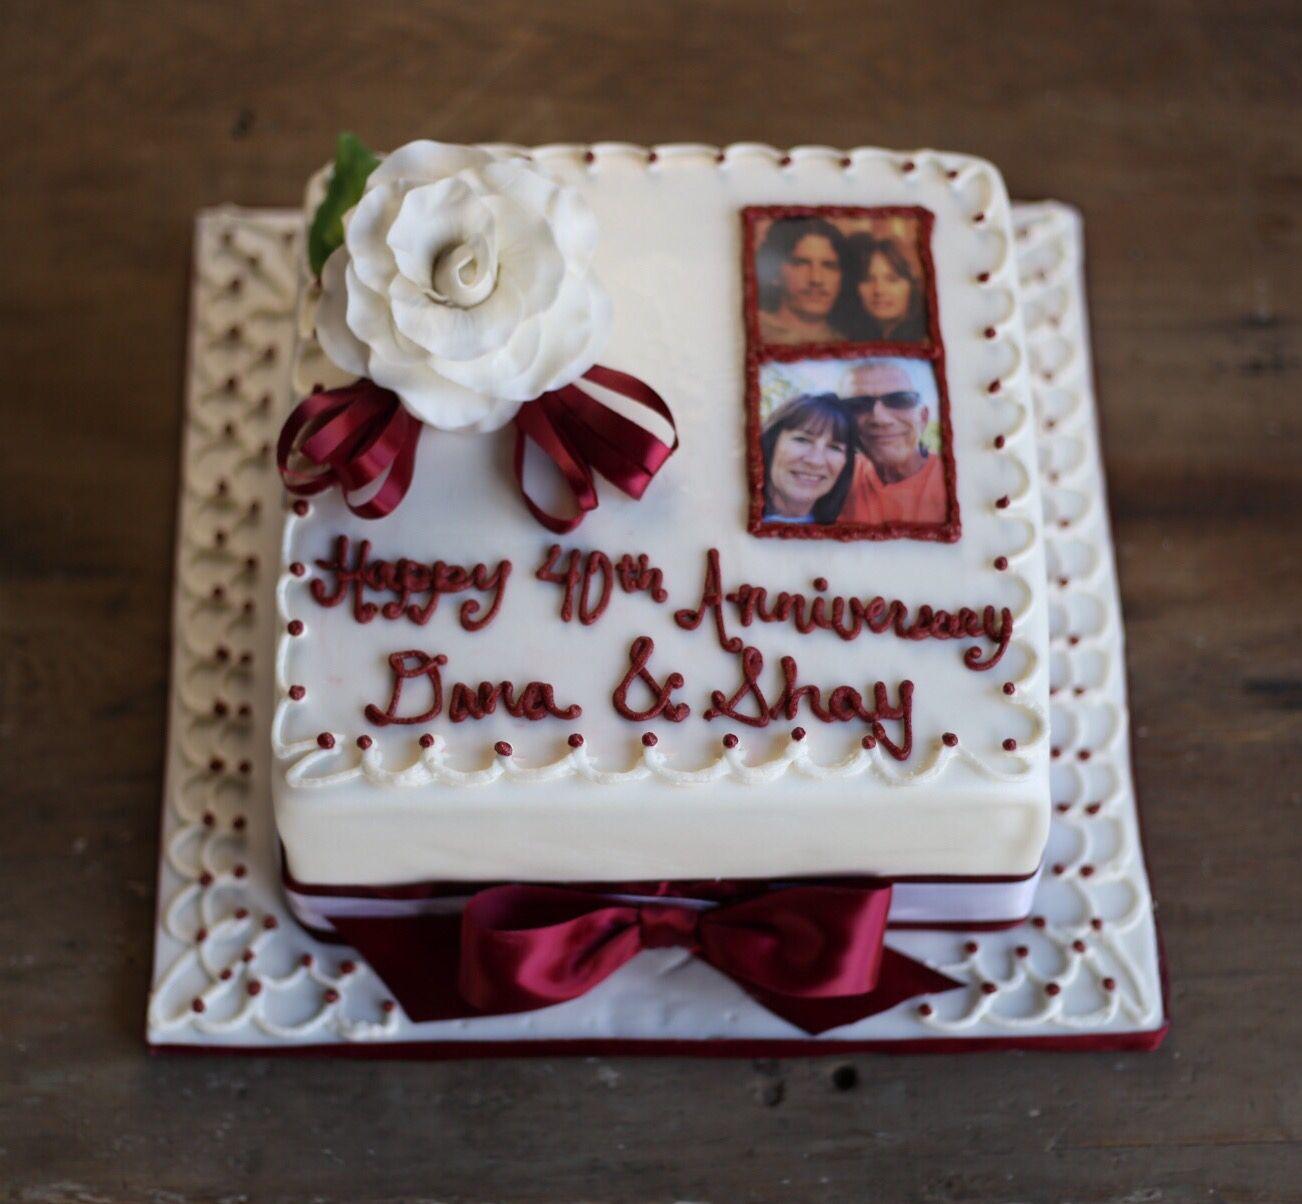 Decoration ideas for 40th wedding anniversary  th anniversary cake  Celebration Cakes  Pinterest  th